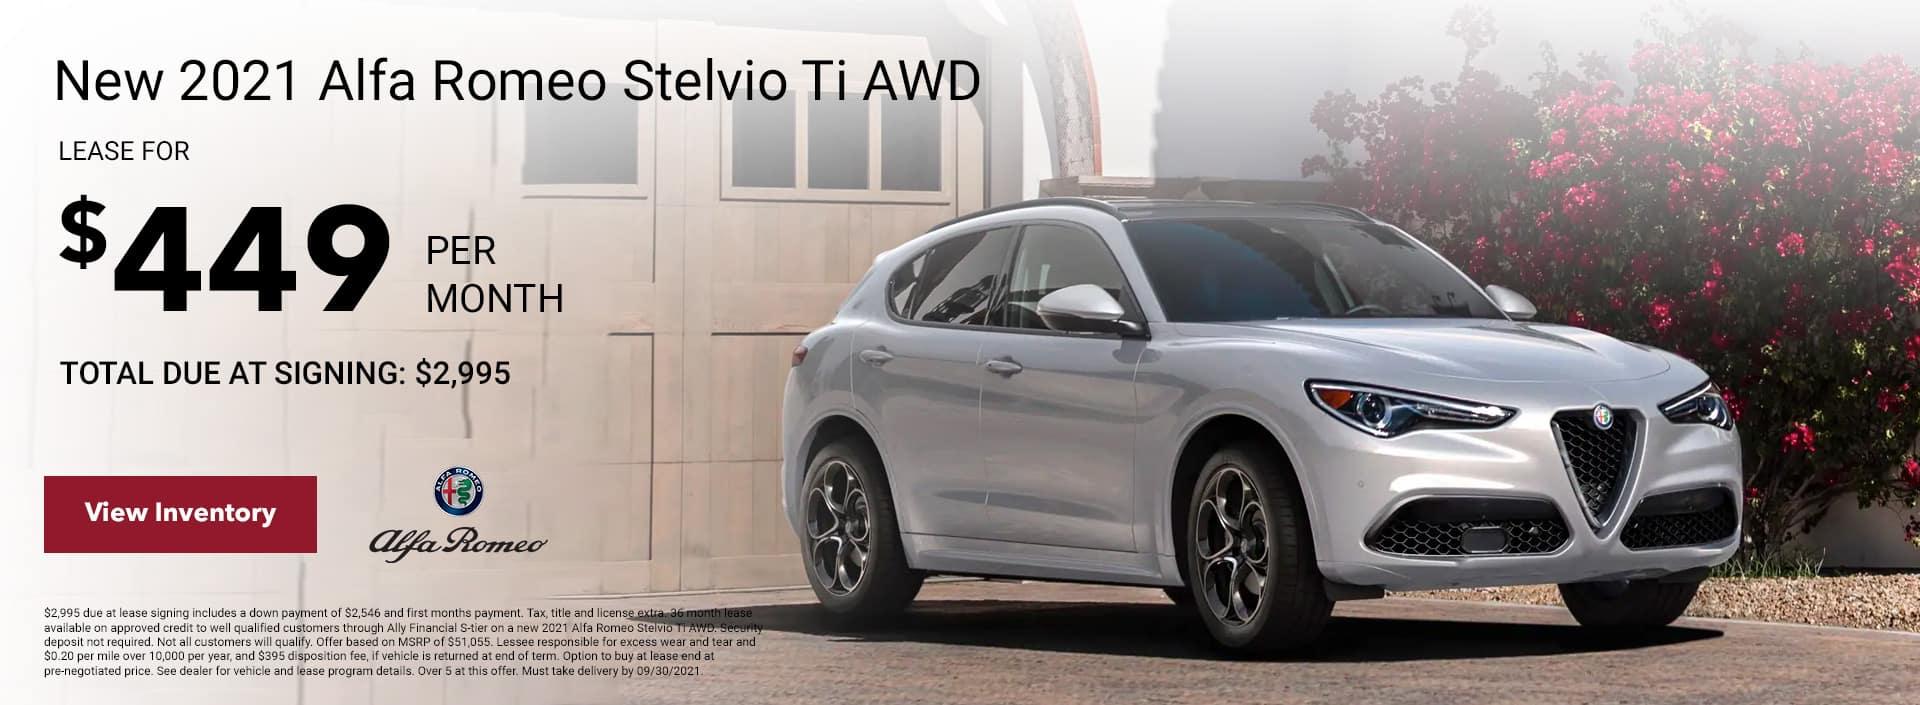 New 2021 Alfa Romeo Stelvio Ti AWD Subheadline: Total due at signing: $2,995 $449/mo